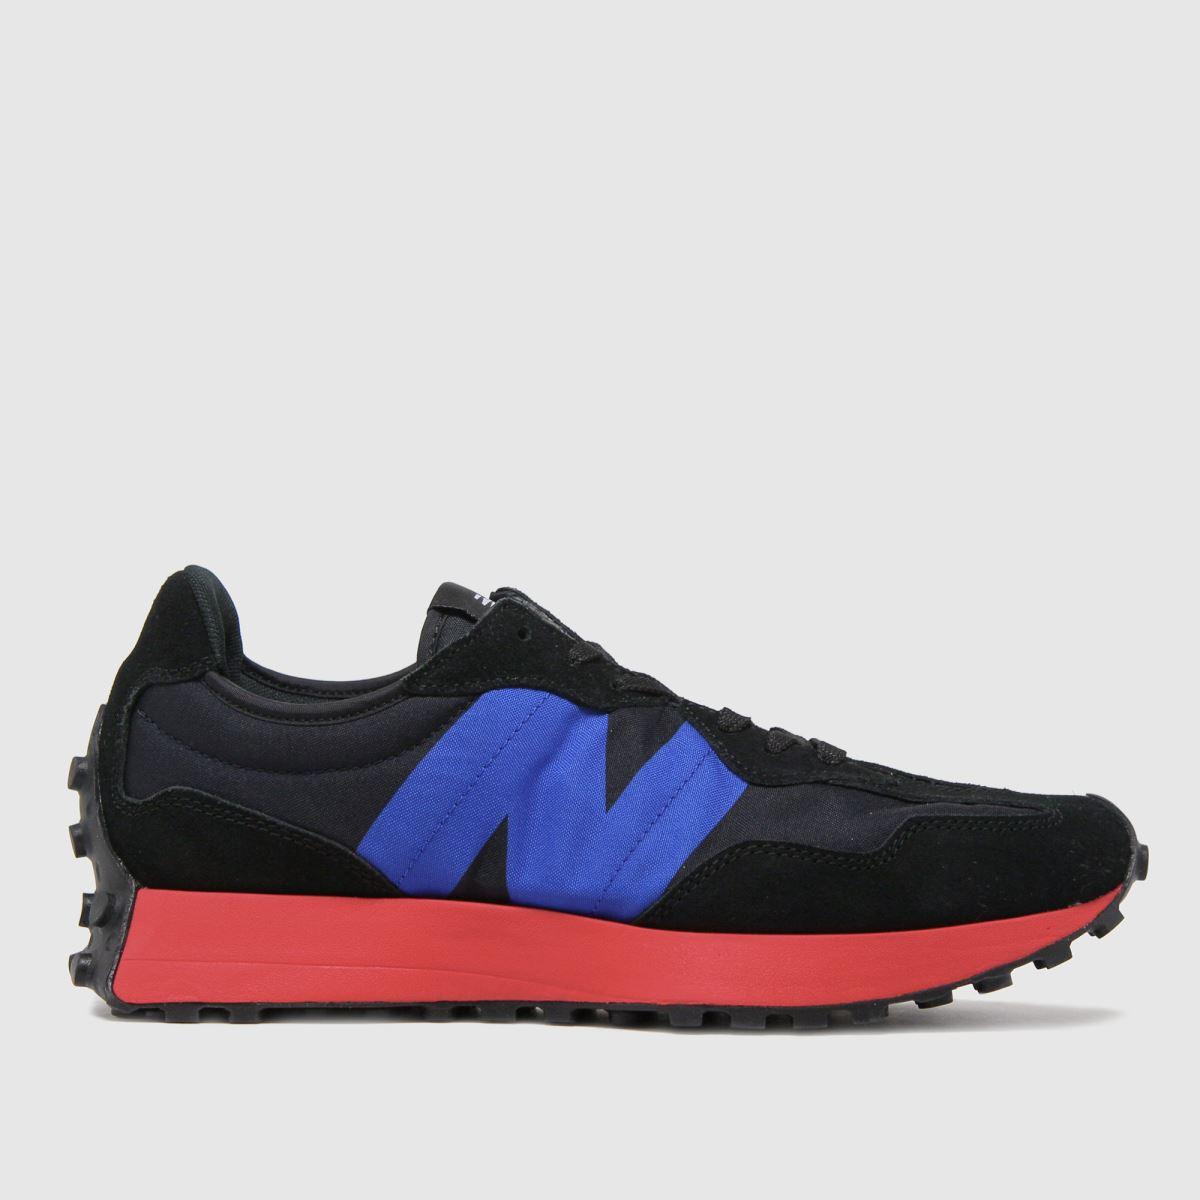 New Balance Black & Navy Nb 327 Trainers